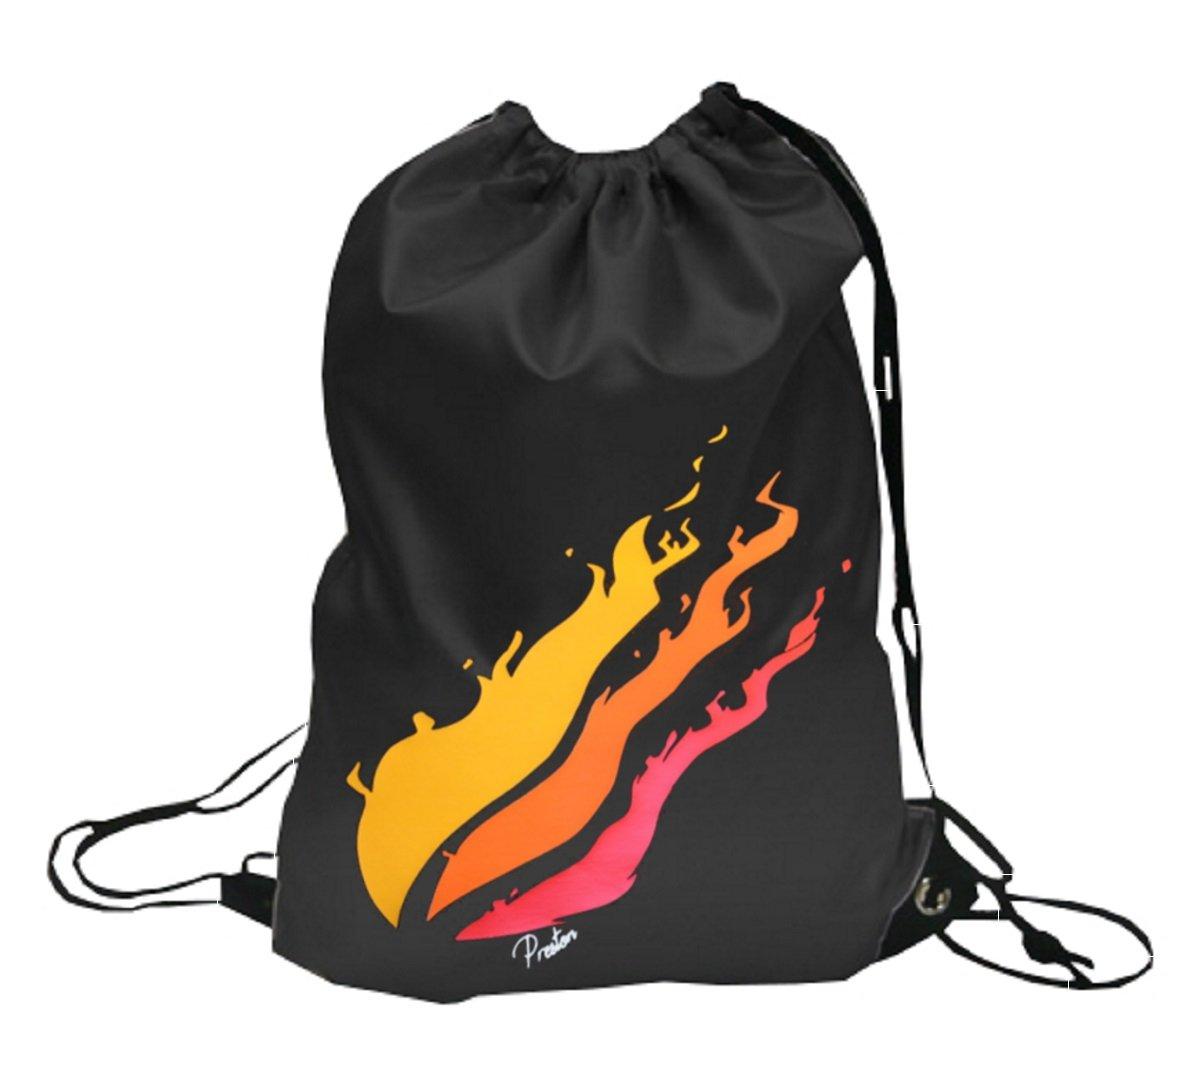 000552 PrestonPlayz Youtuber Logo, Drawstring Backpack Rucksack School Bag